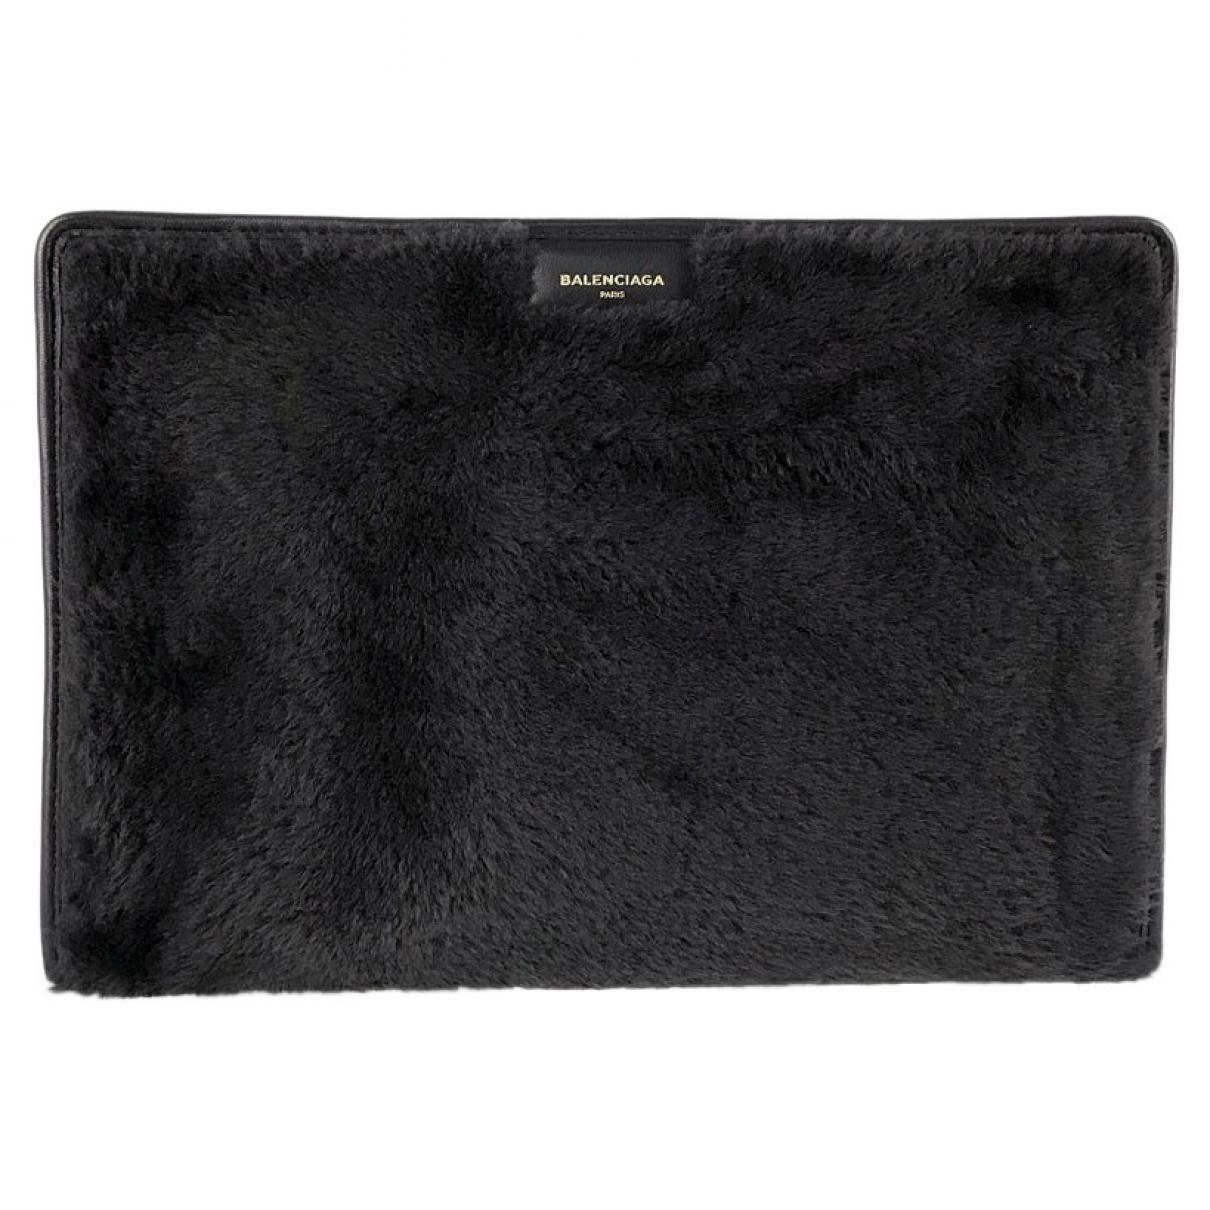 Balenciaga - Pochette   pour femme en mouton - noir